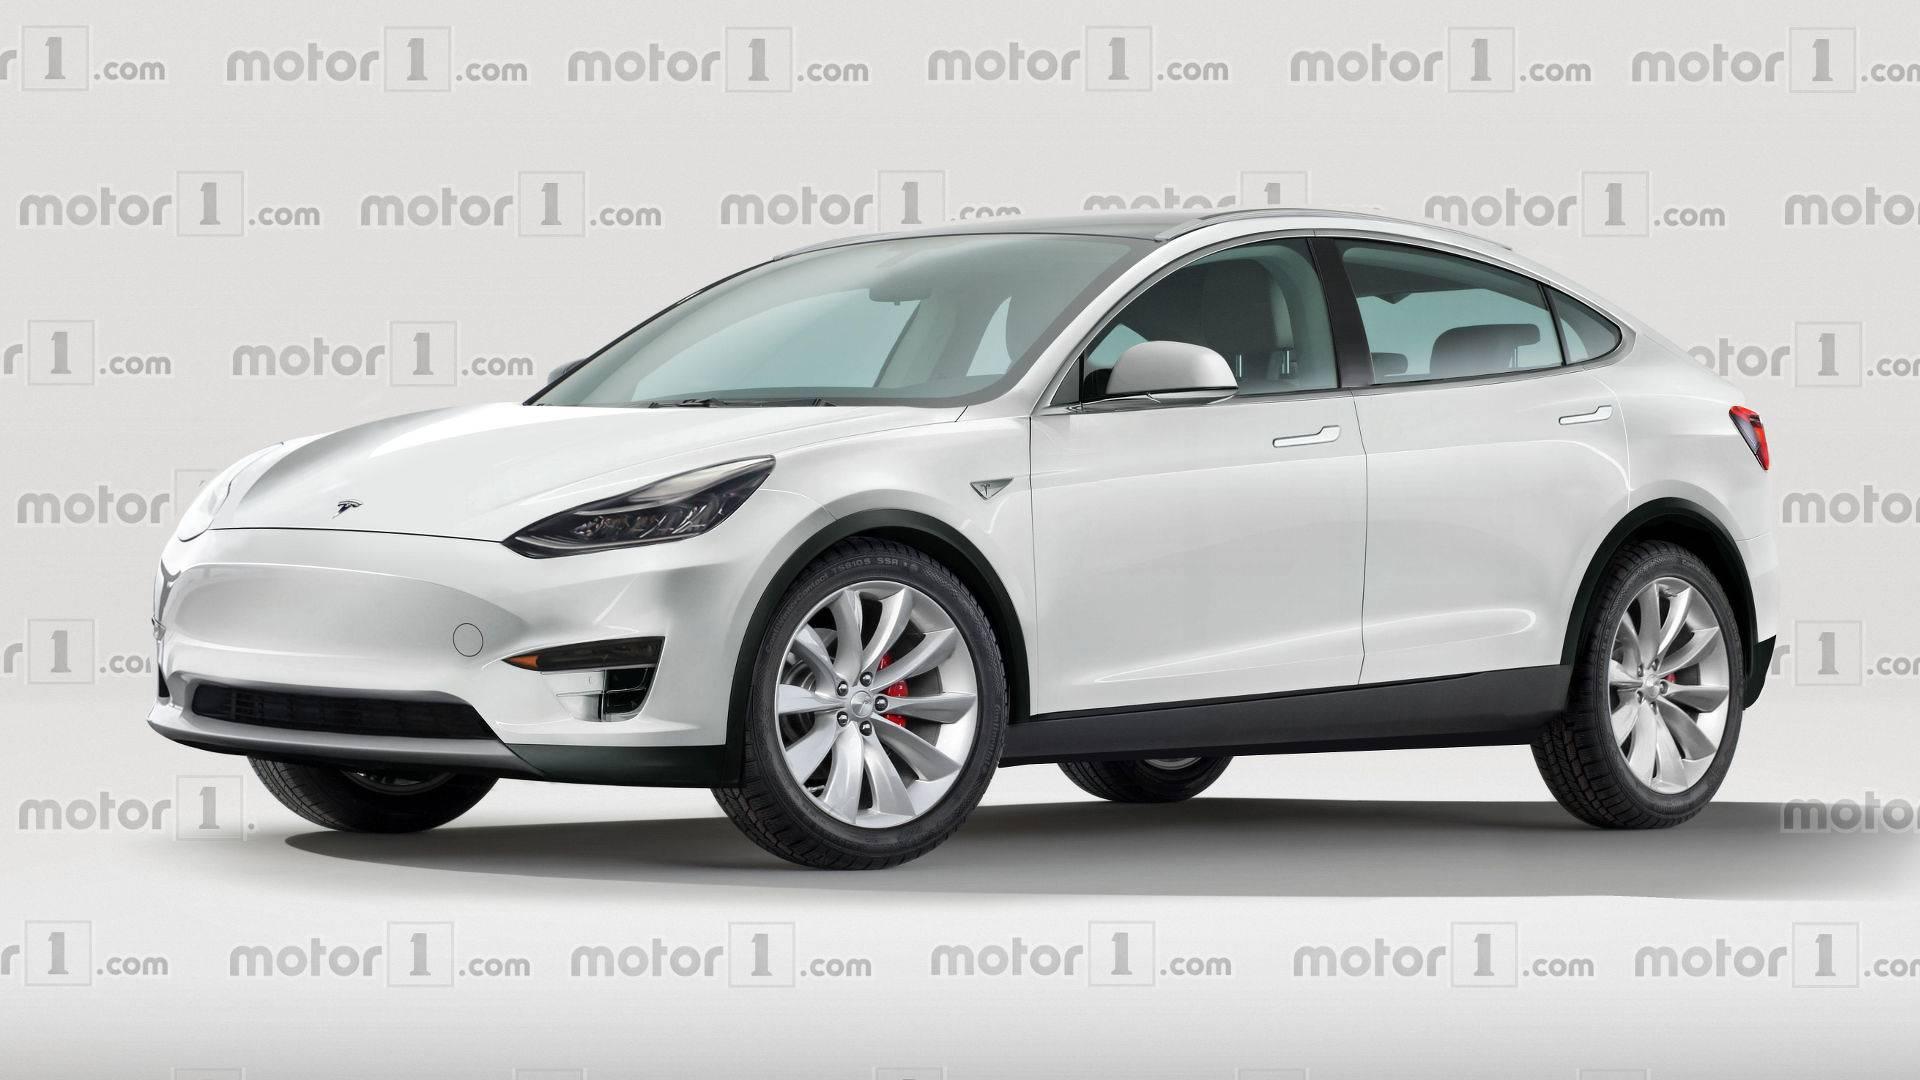 Tesla Model Y Facebook: Tesla Model Y Rendering Previews Future EV Bestseller